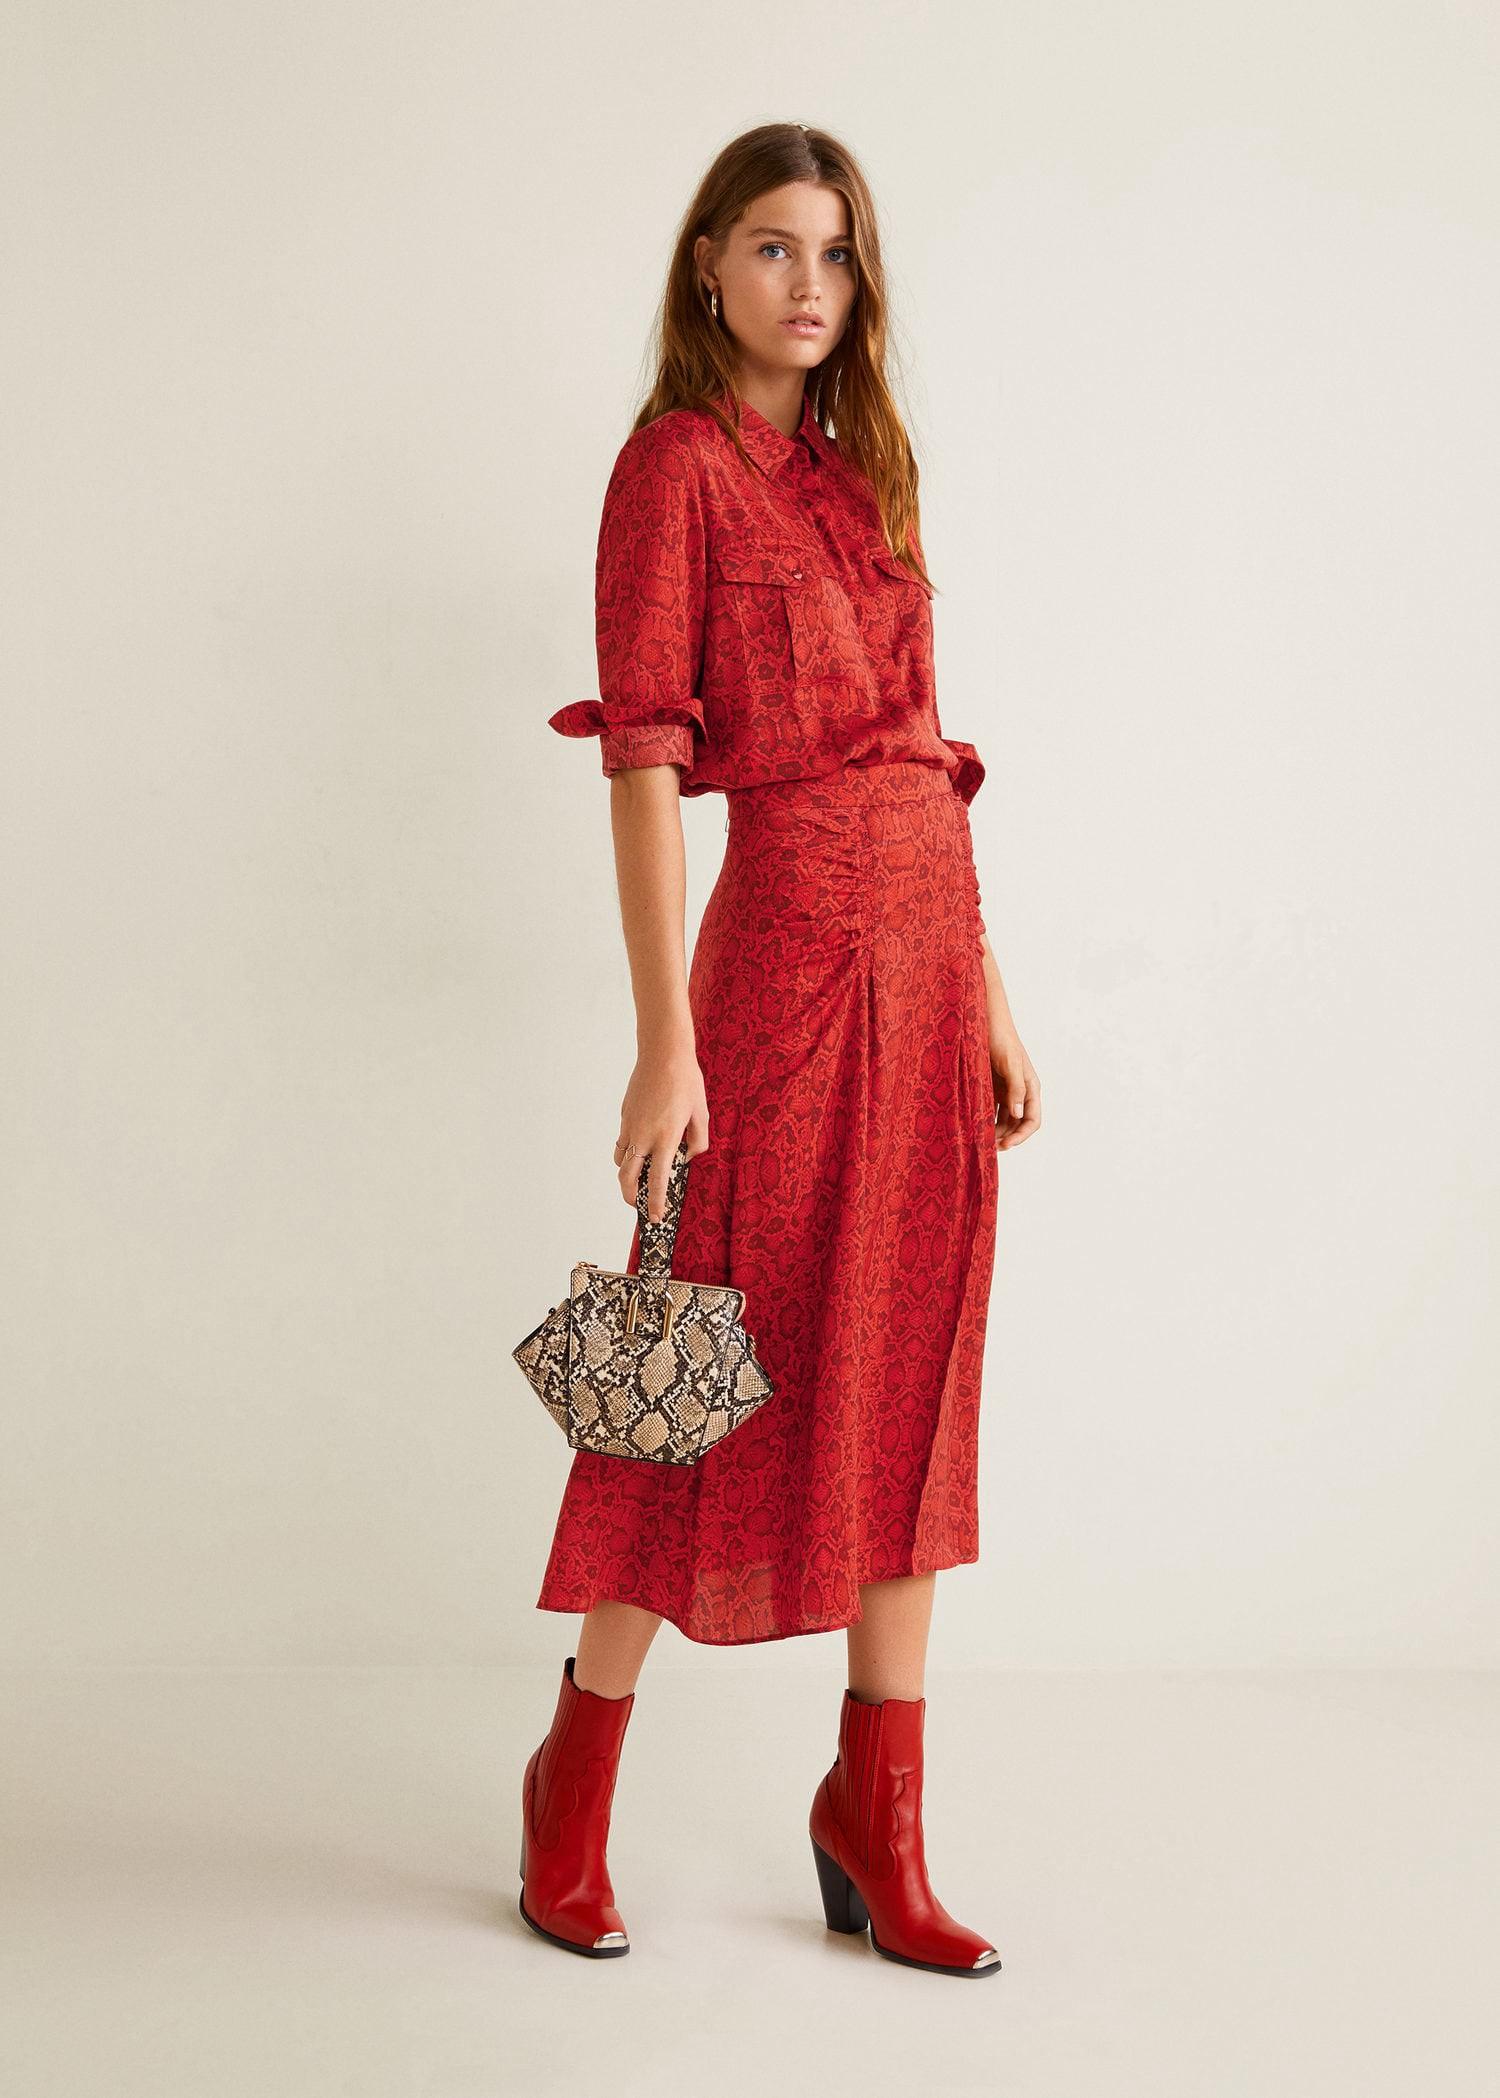 fc38e9ad Mango Snake Print Skirt - S | Products | Printed skirts, Fashion ...